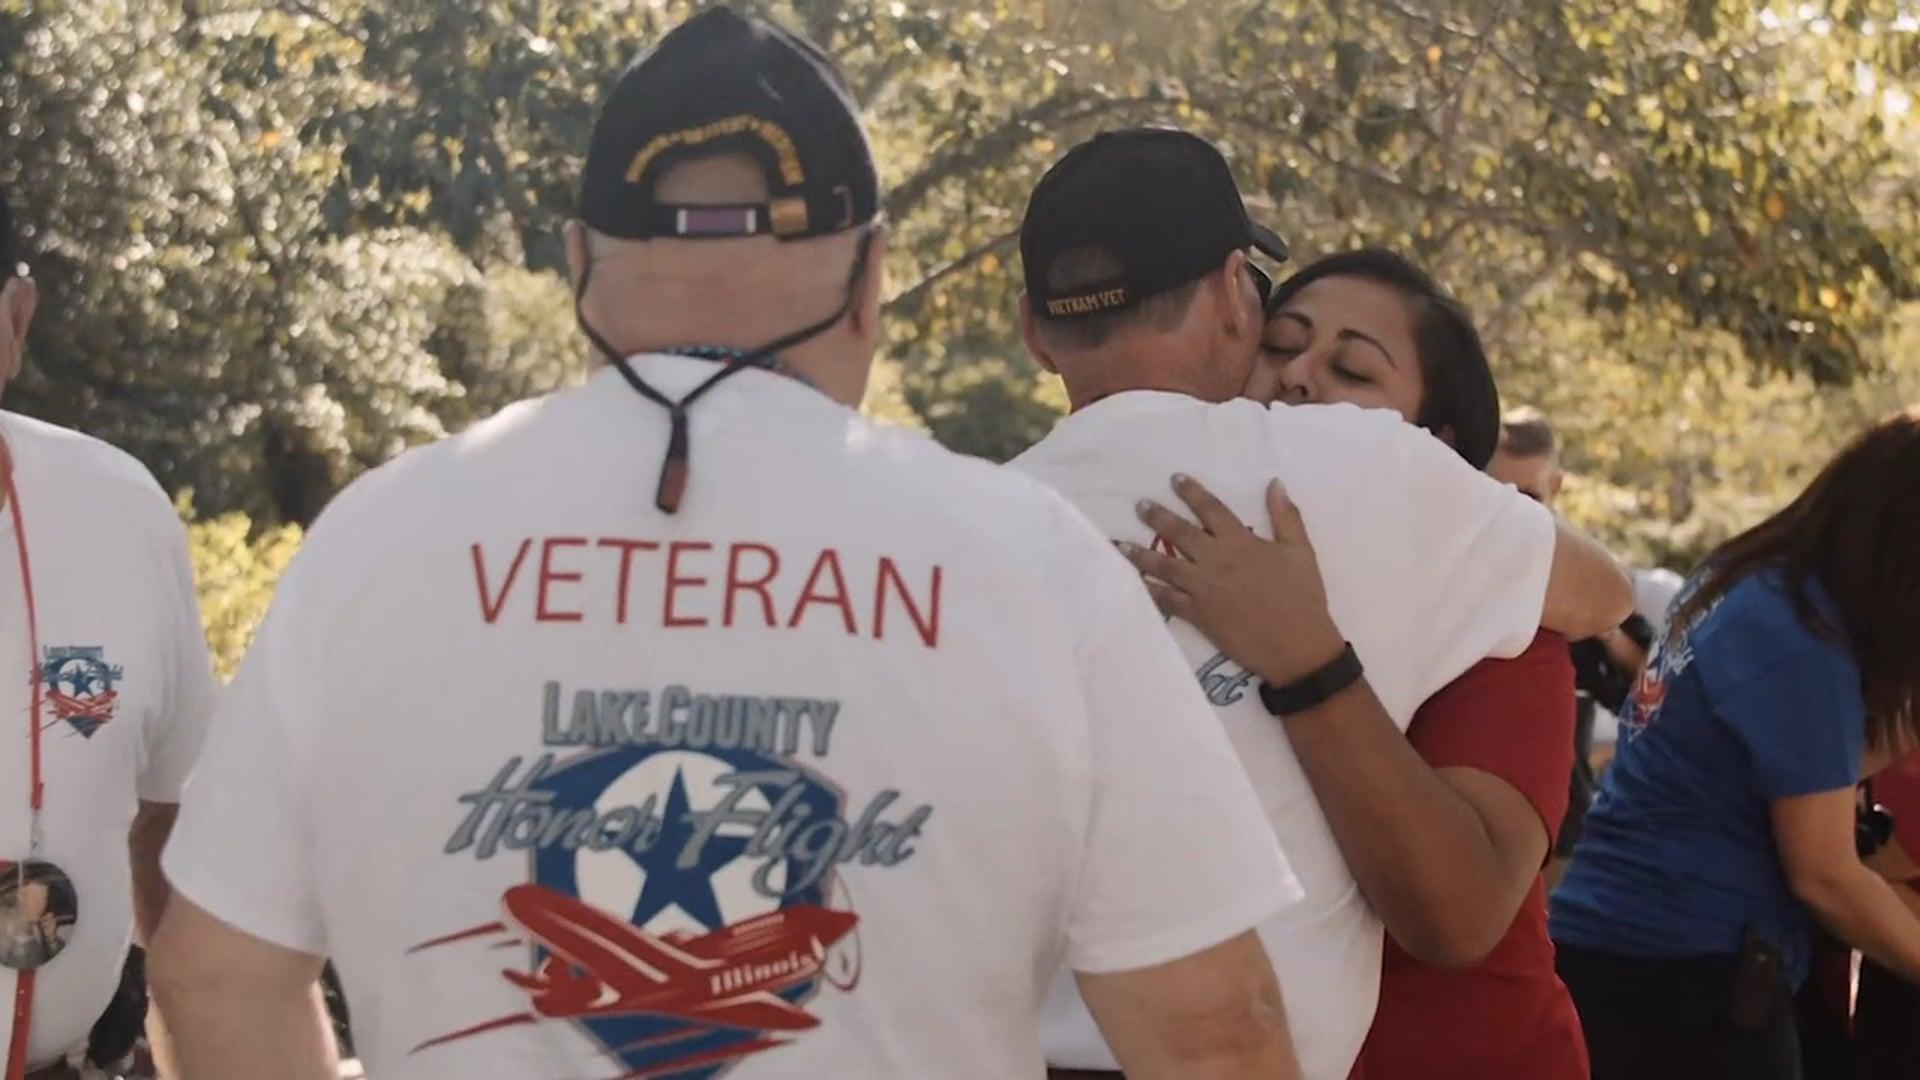 Lake County Honor Flight | Veterans Day